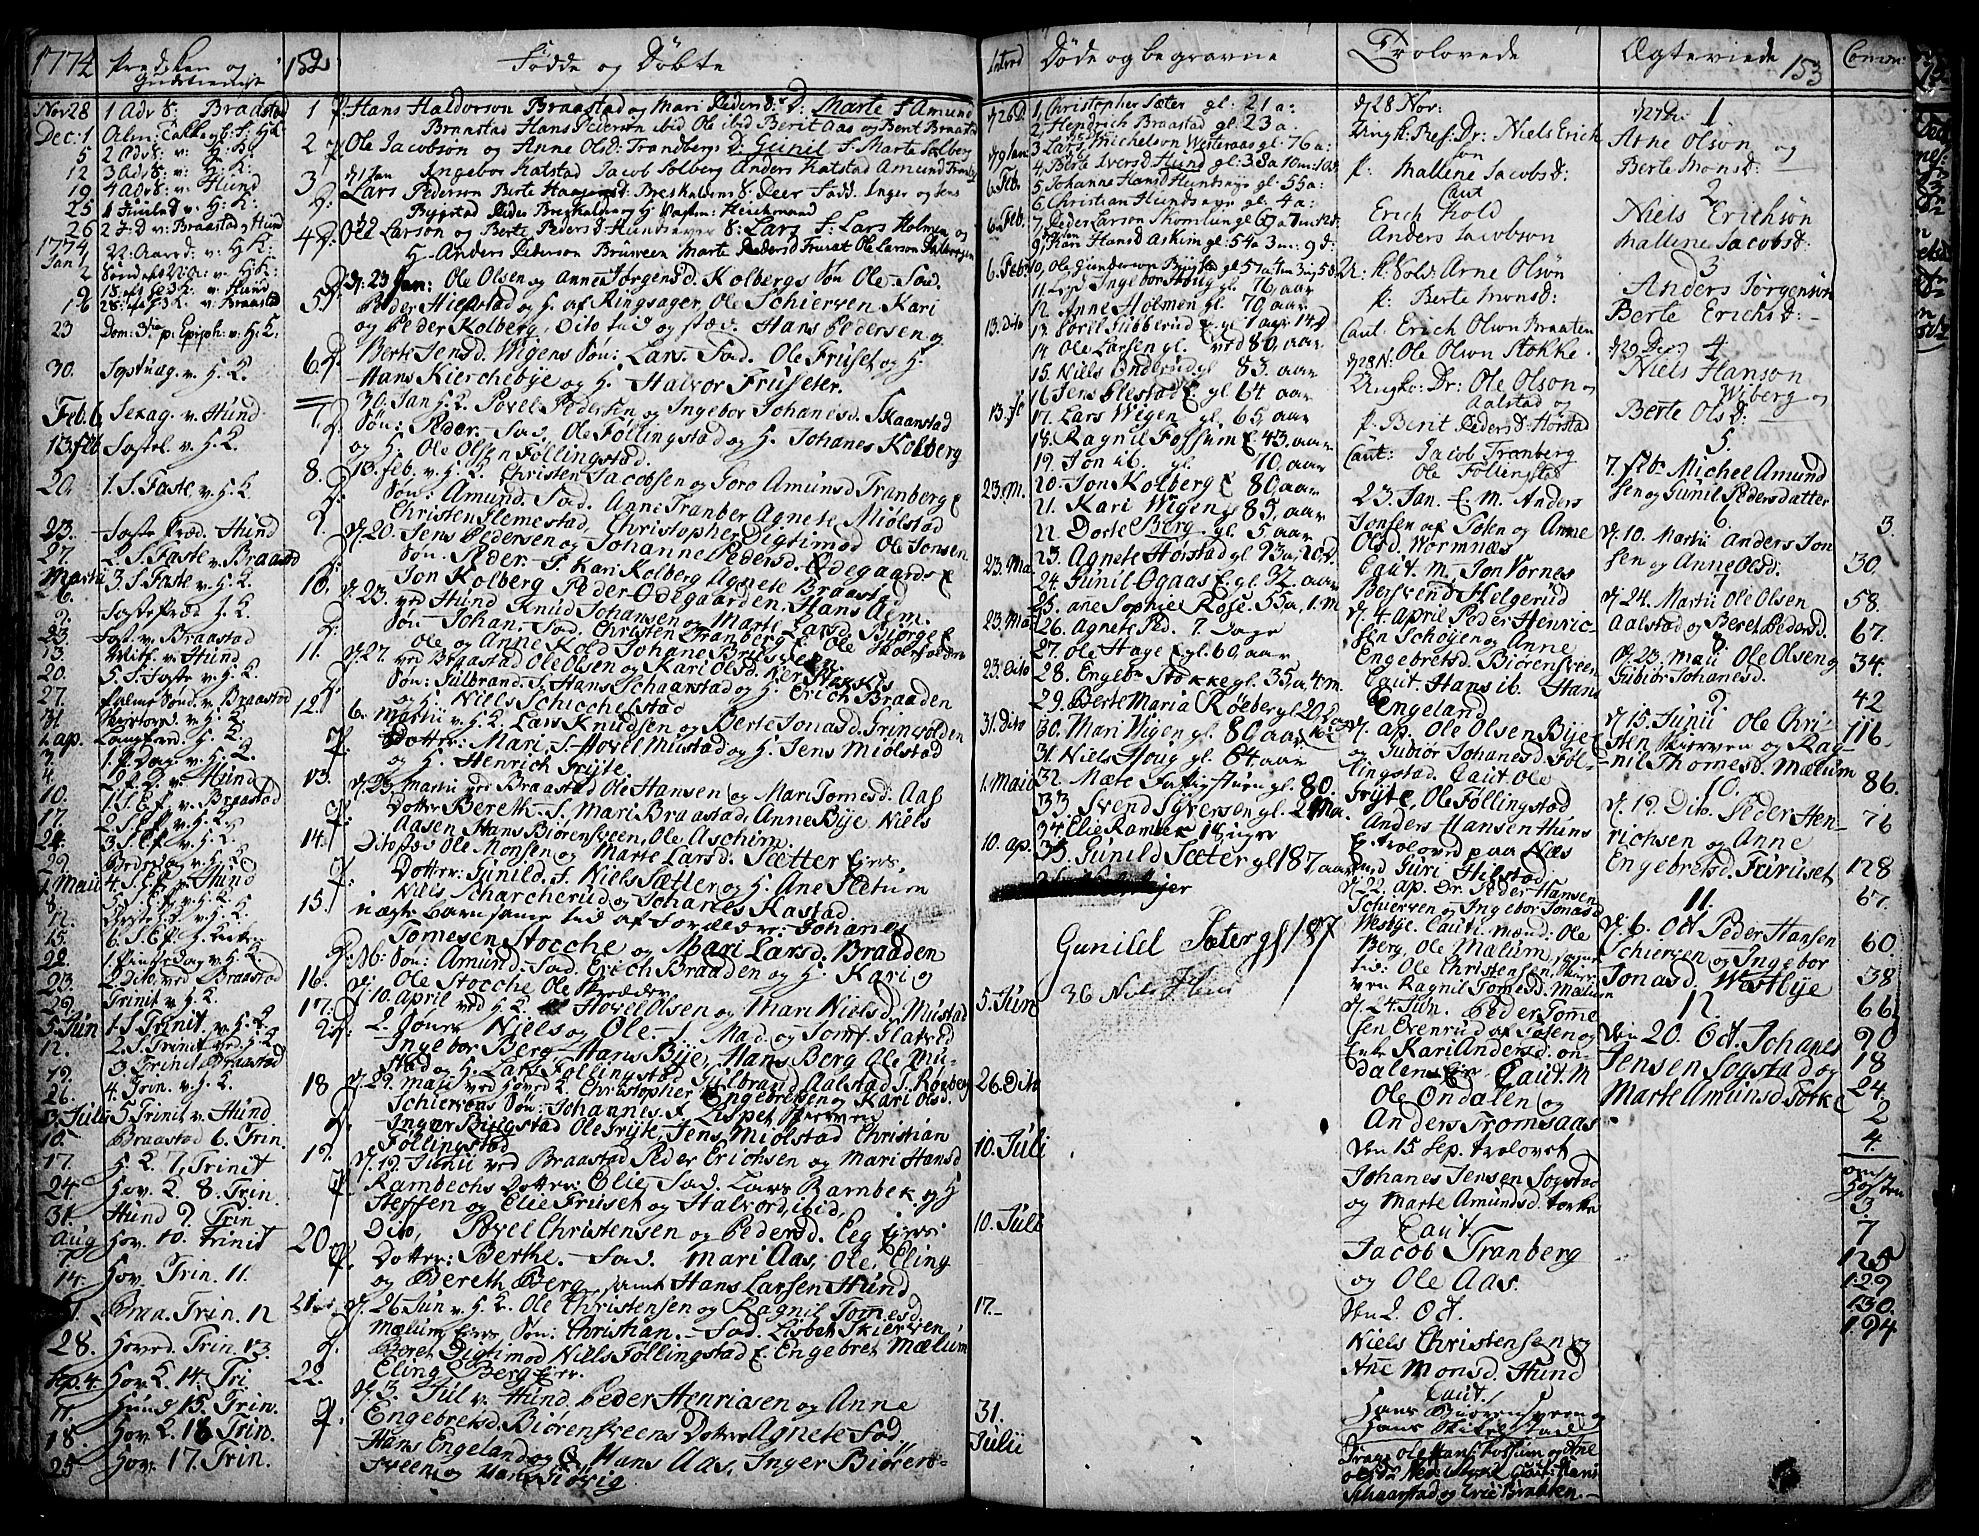 SAH, Vardal prestekontor, H/Ha/Haa/L0002: Ministerialbok nr. 2, 1748-1776, s. 152-153